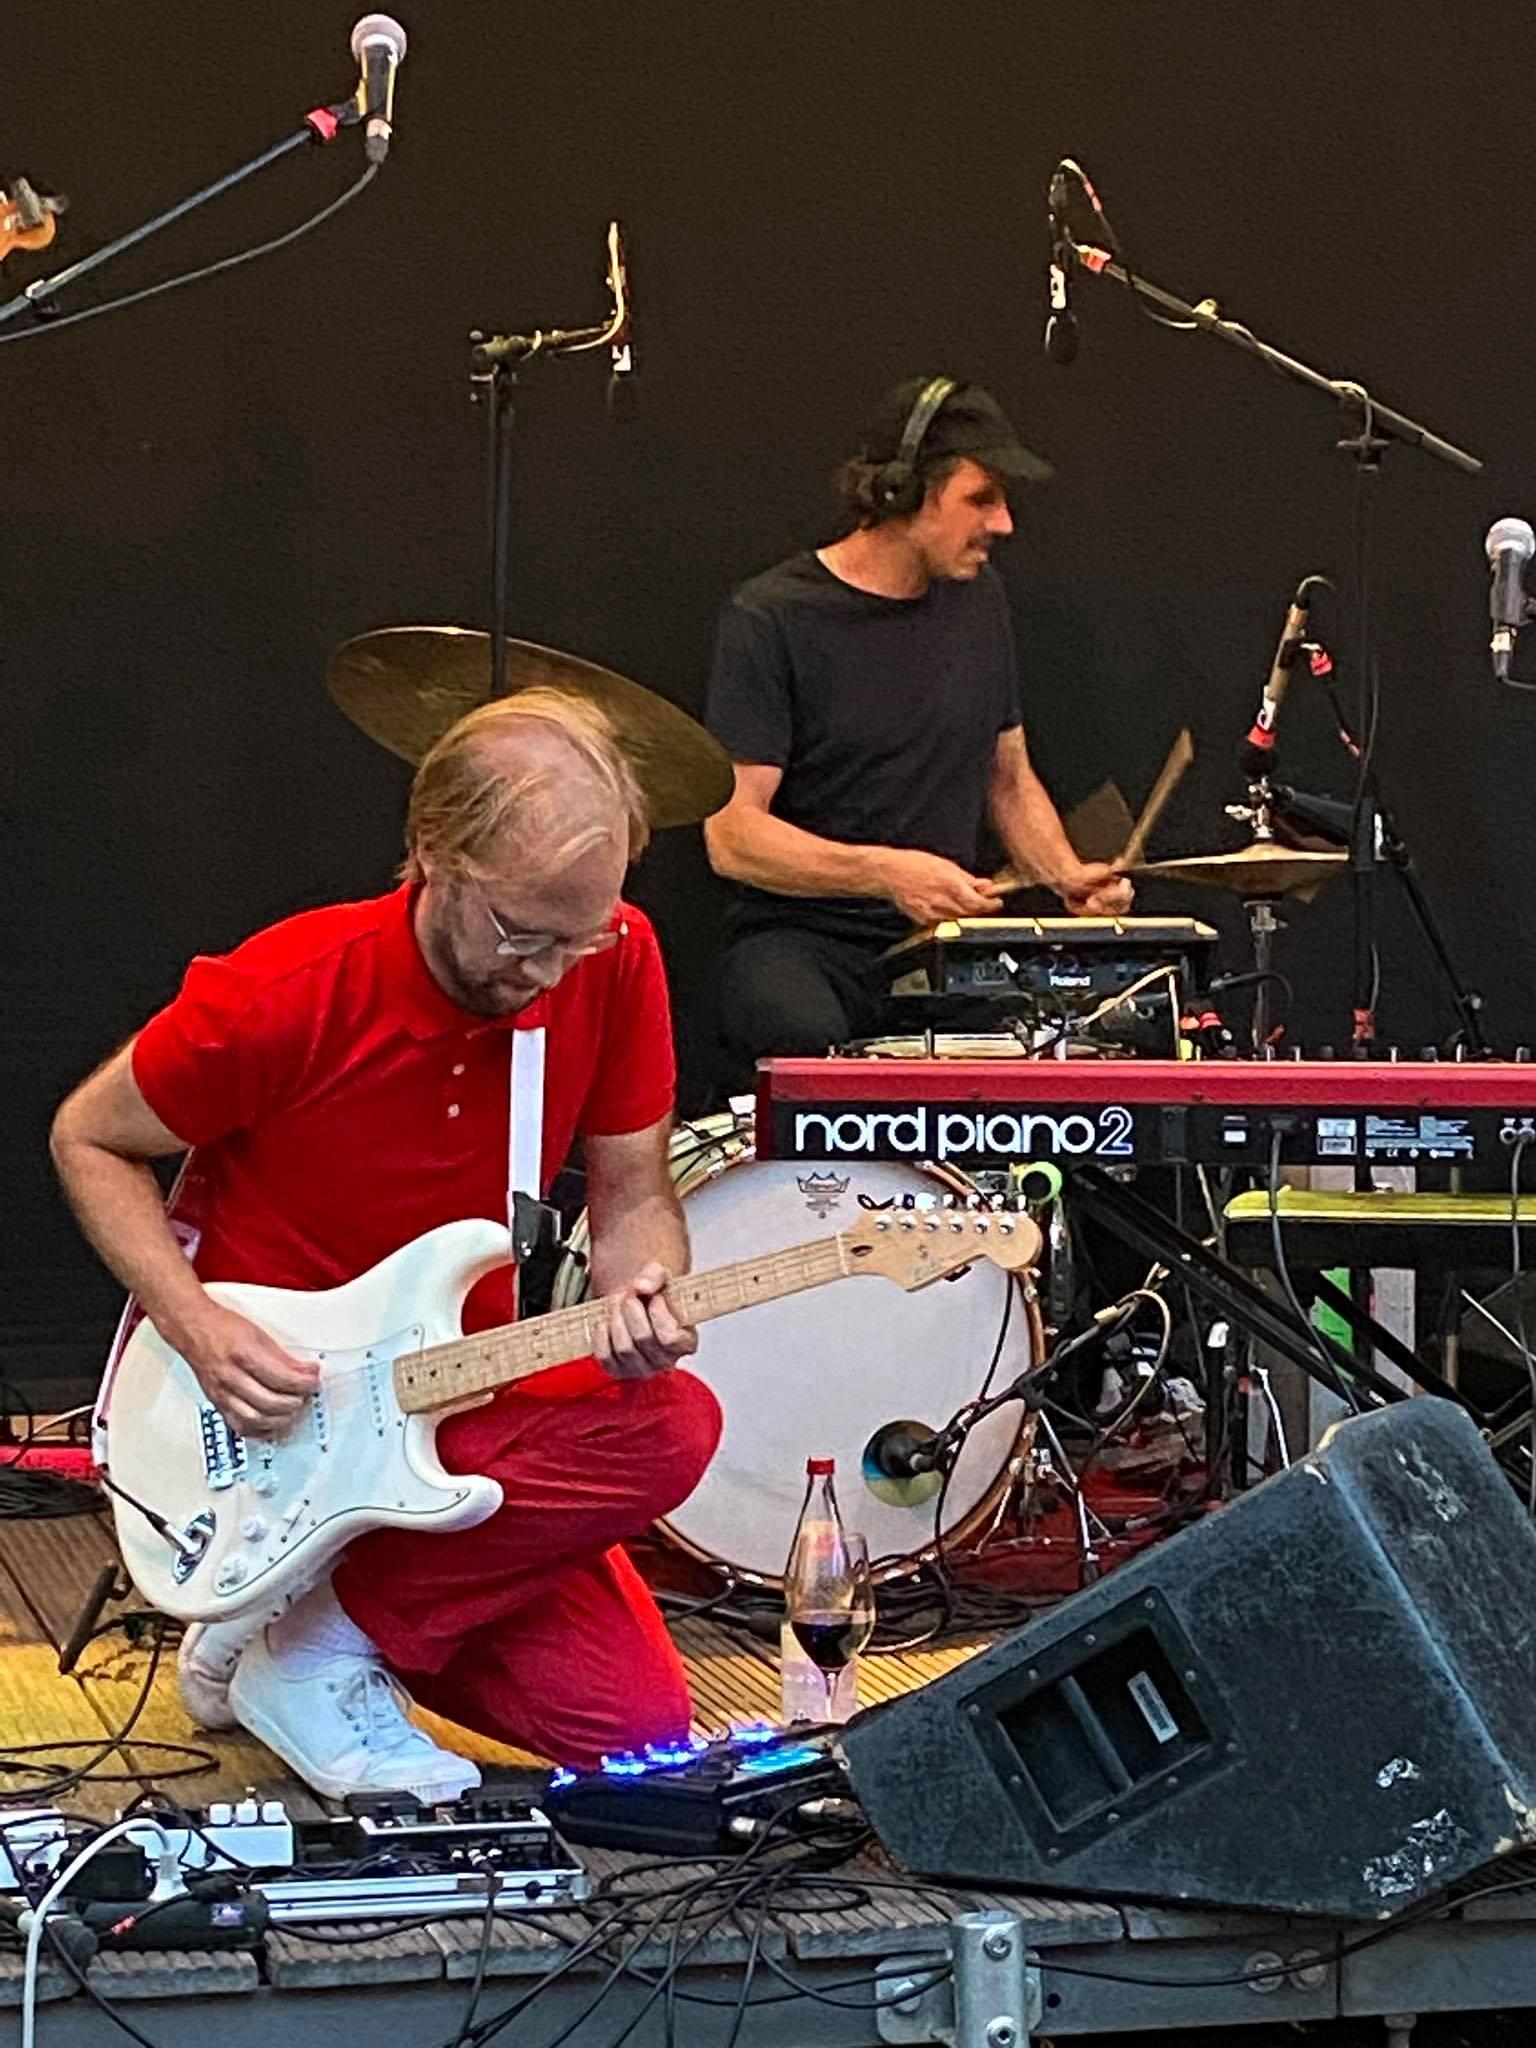 Albrecht Schrader, Musiker, Band, Knust, Lattenplatz, Koralle Blau, Konzert, open-air